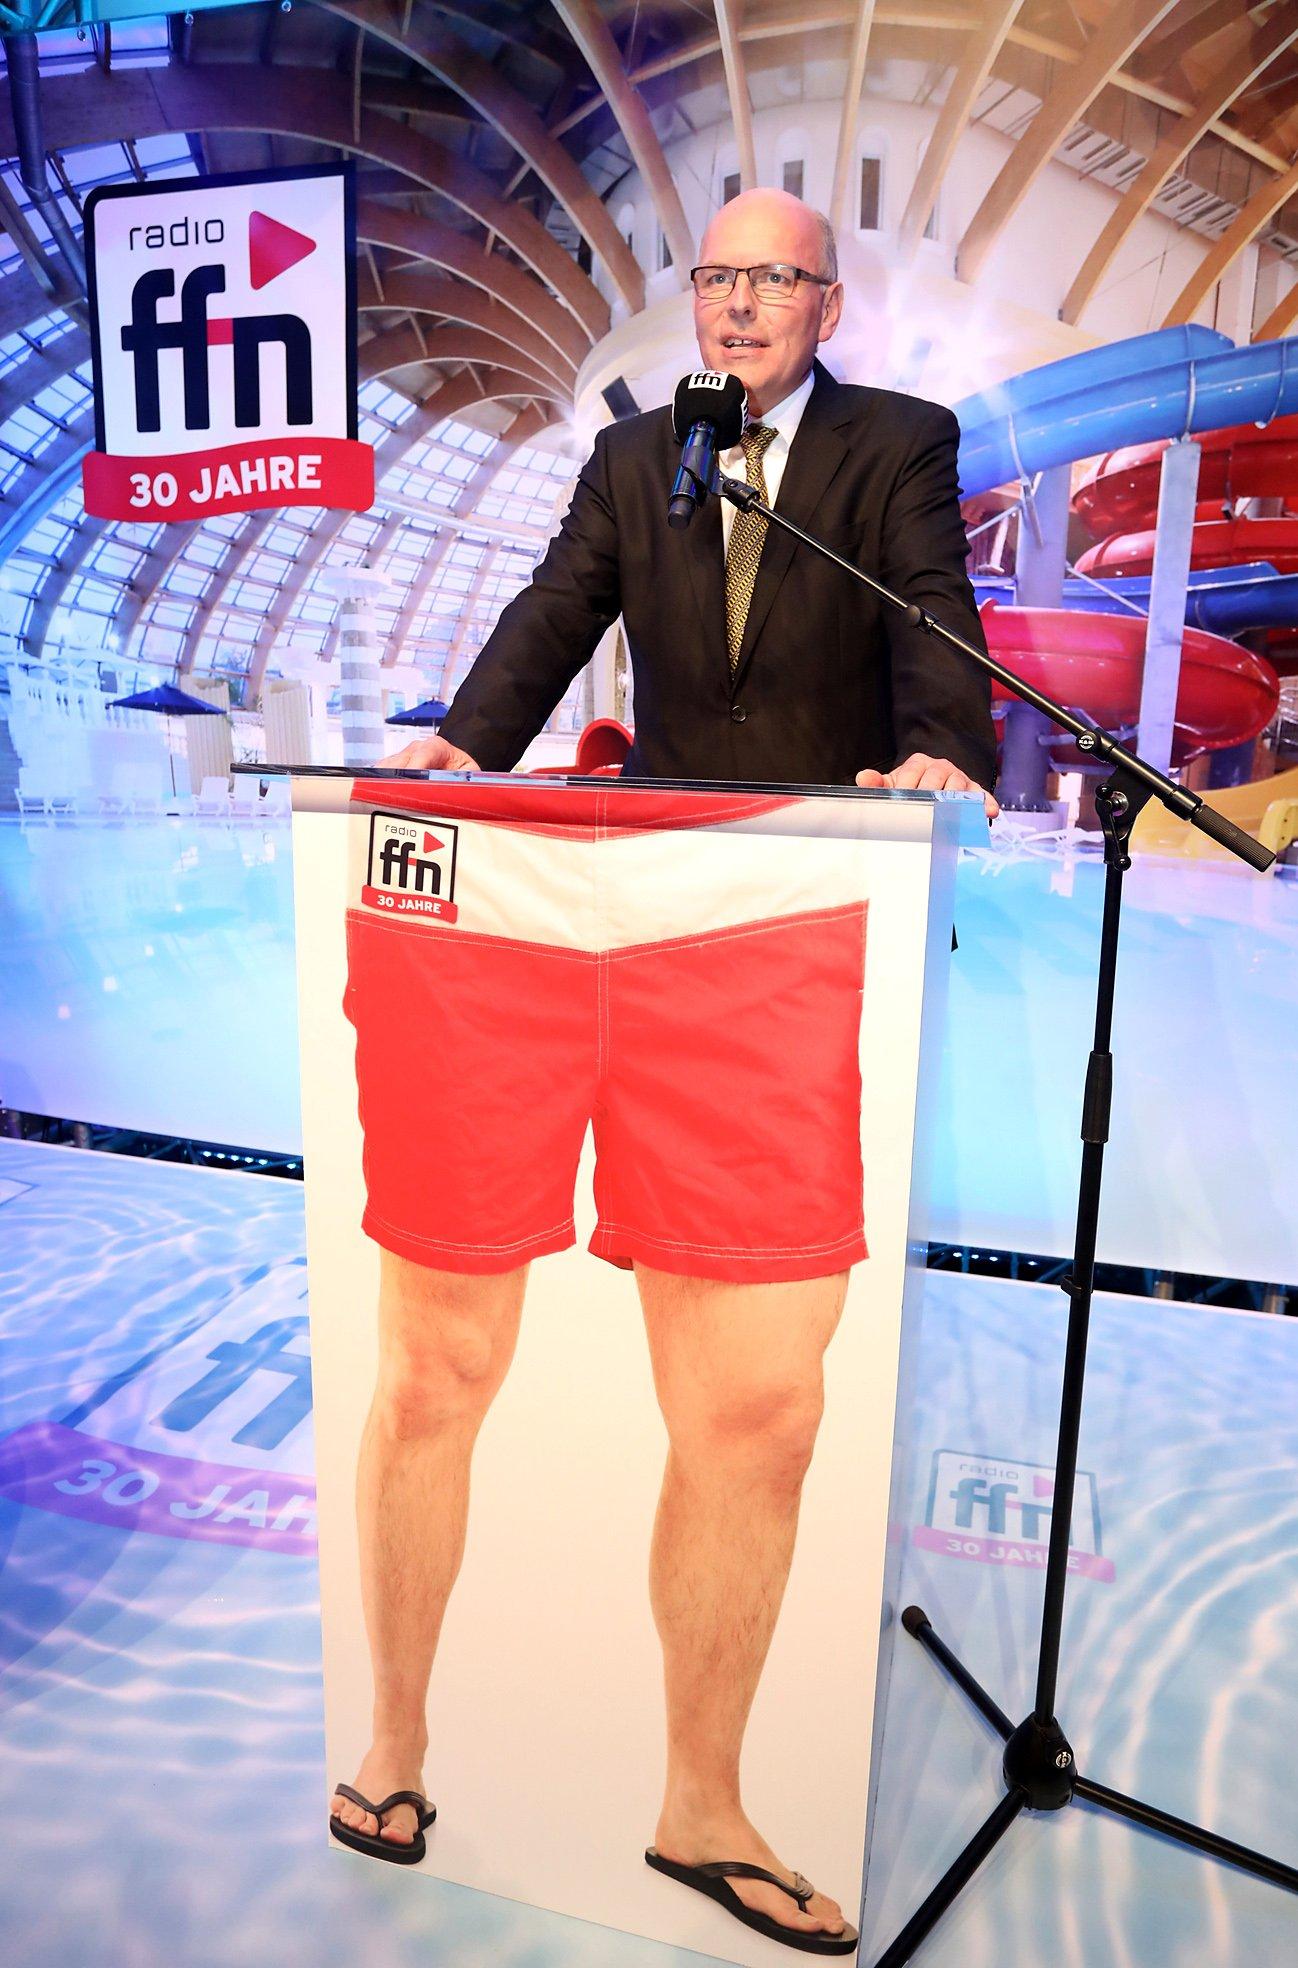 ffn-Geschäftsführer Harald Gehrung